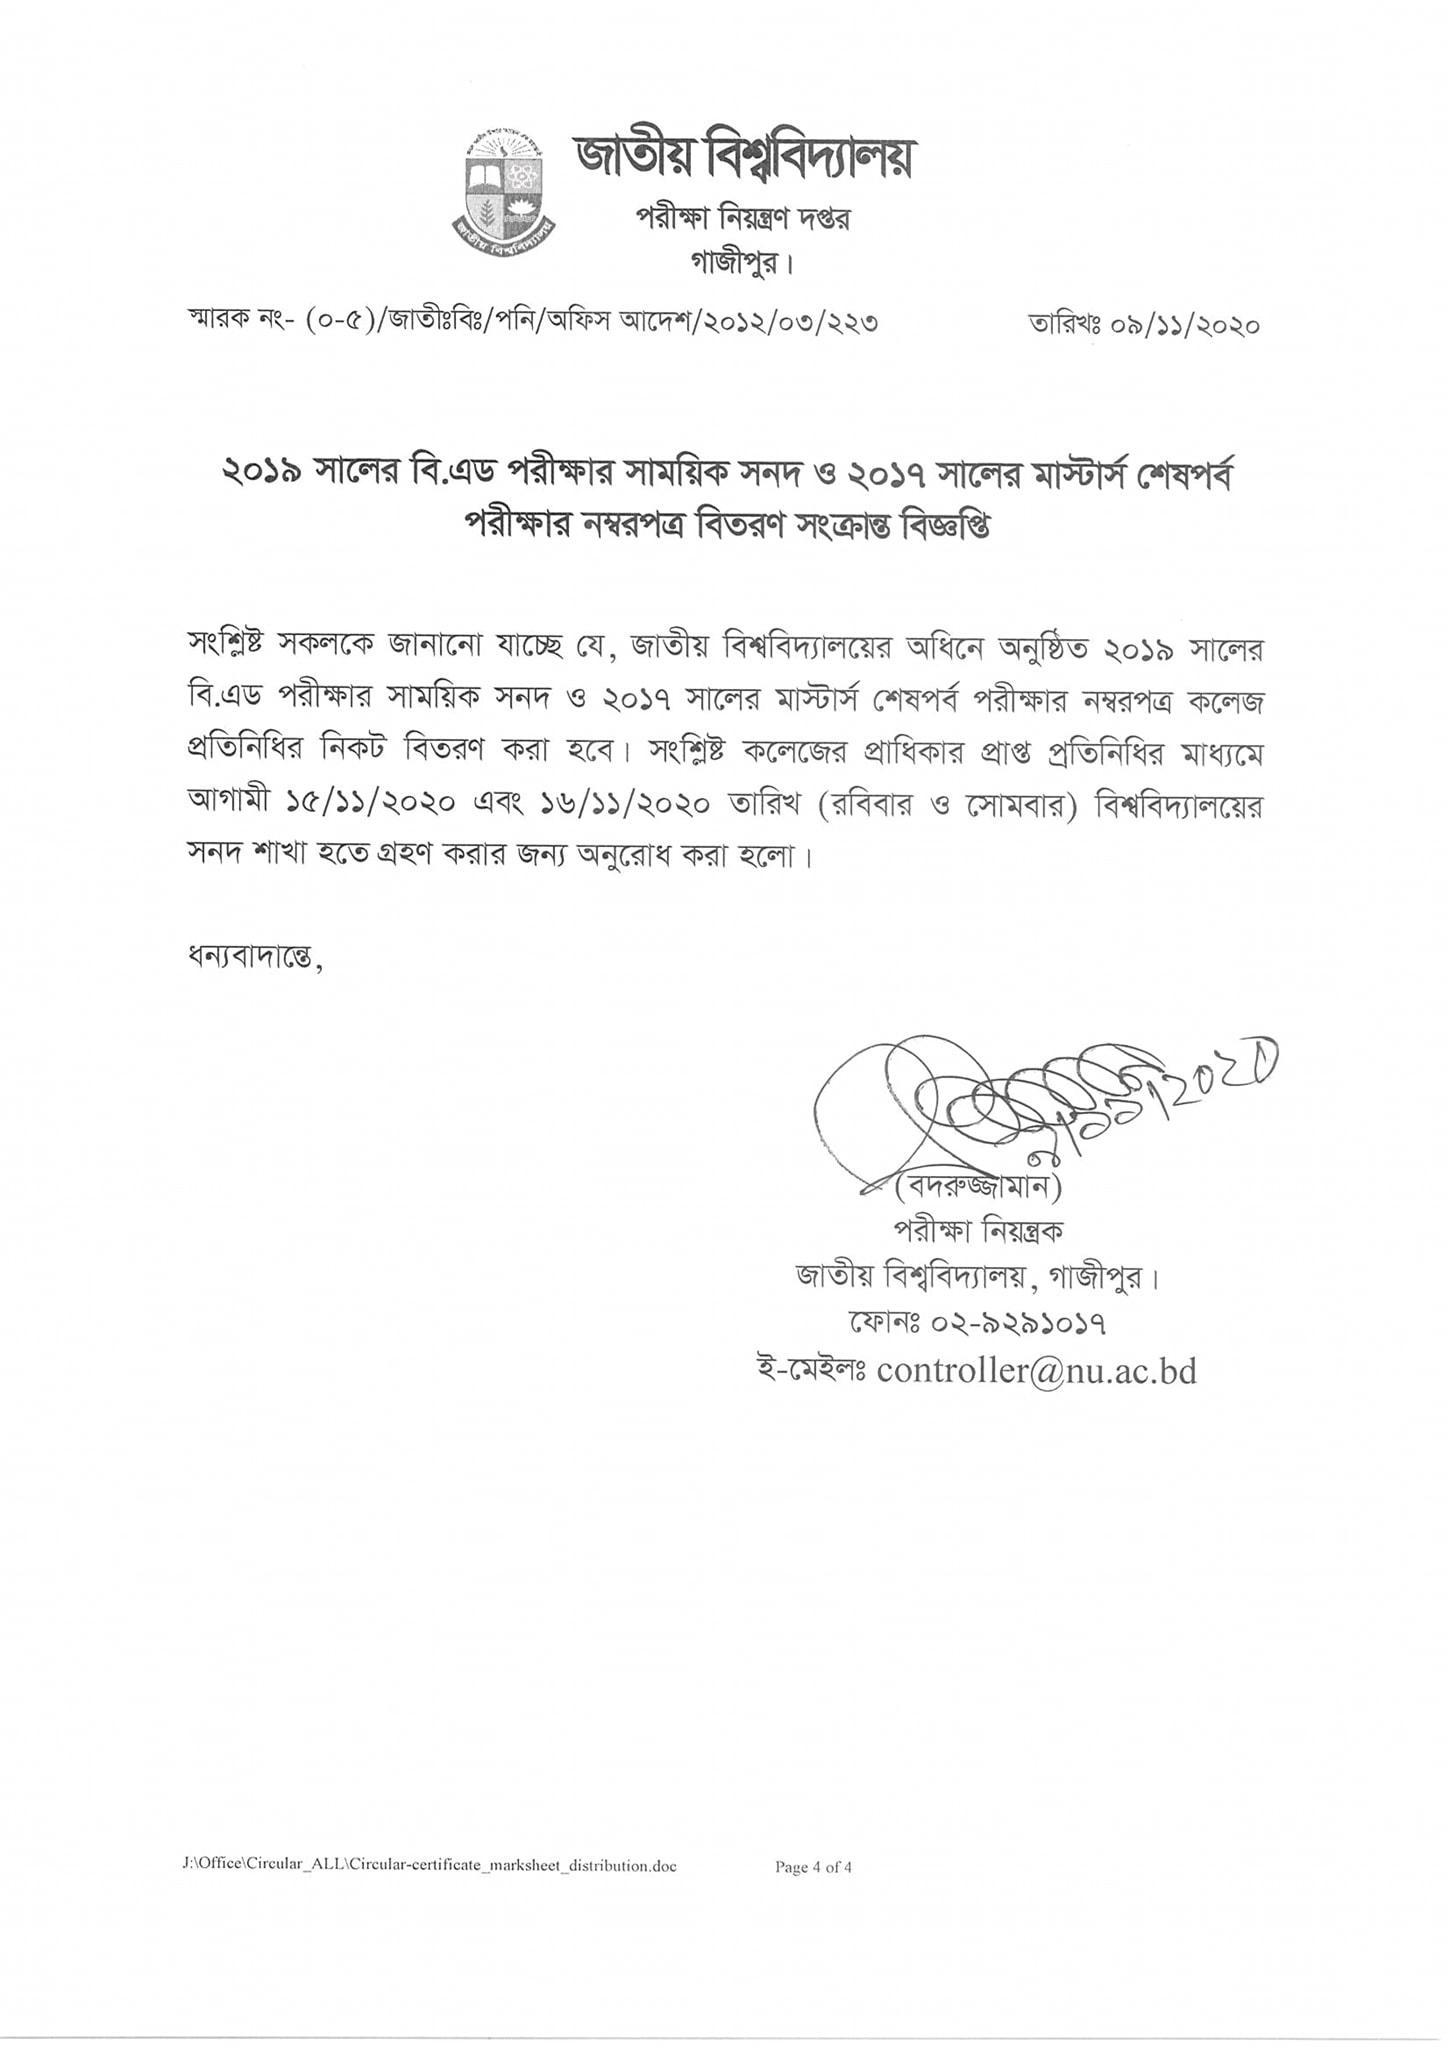 national University masters certificate